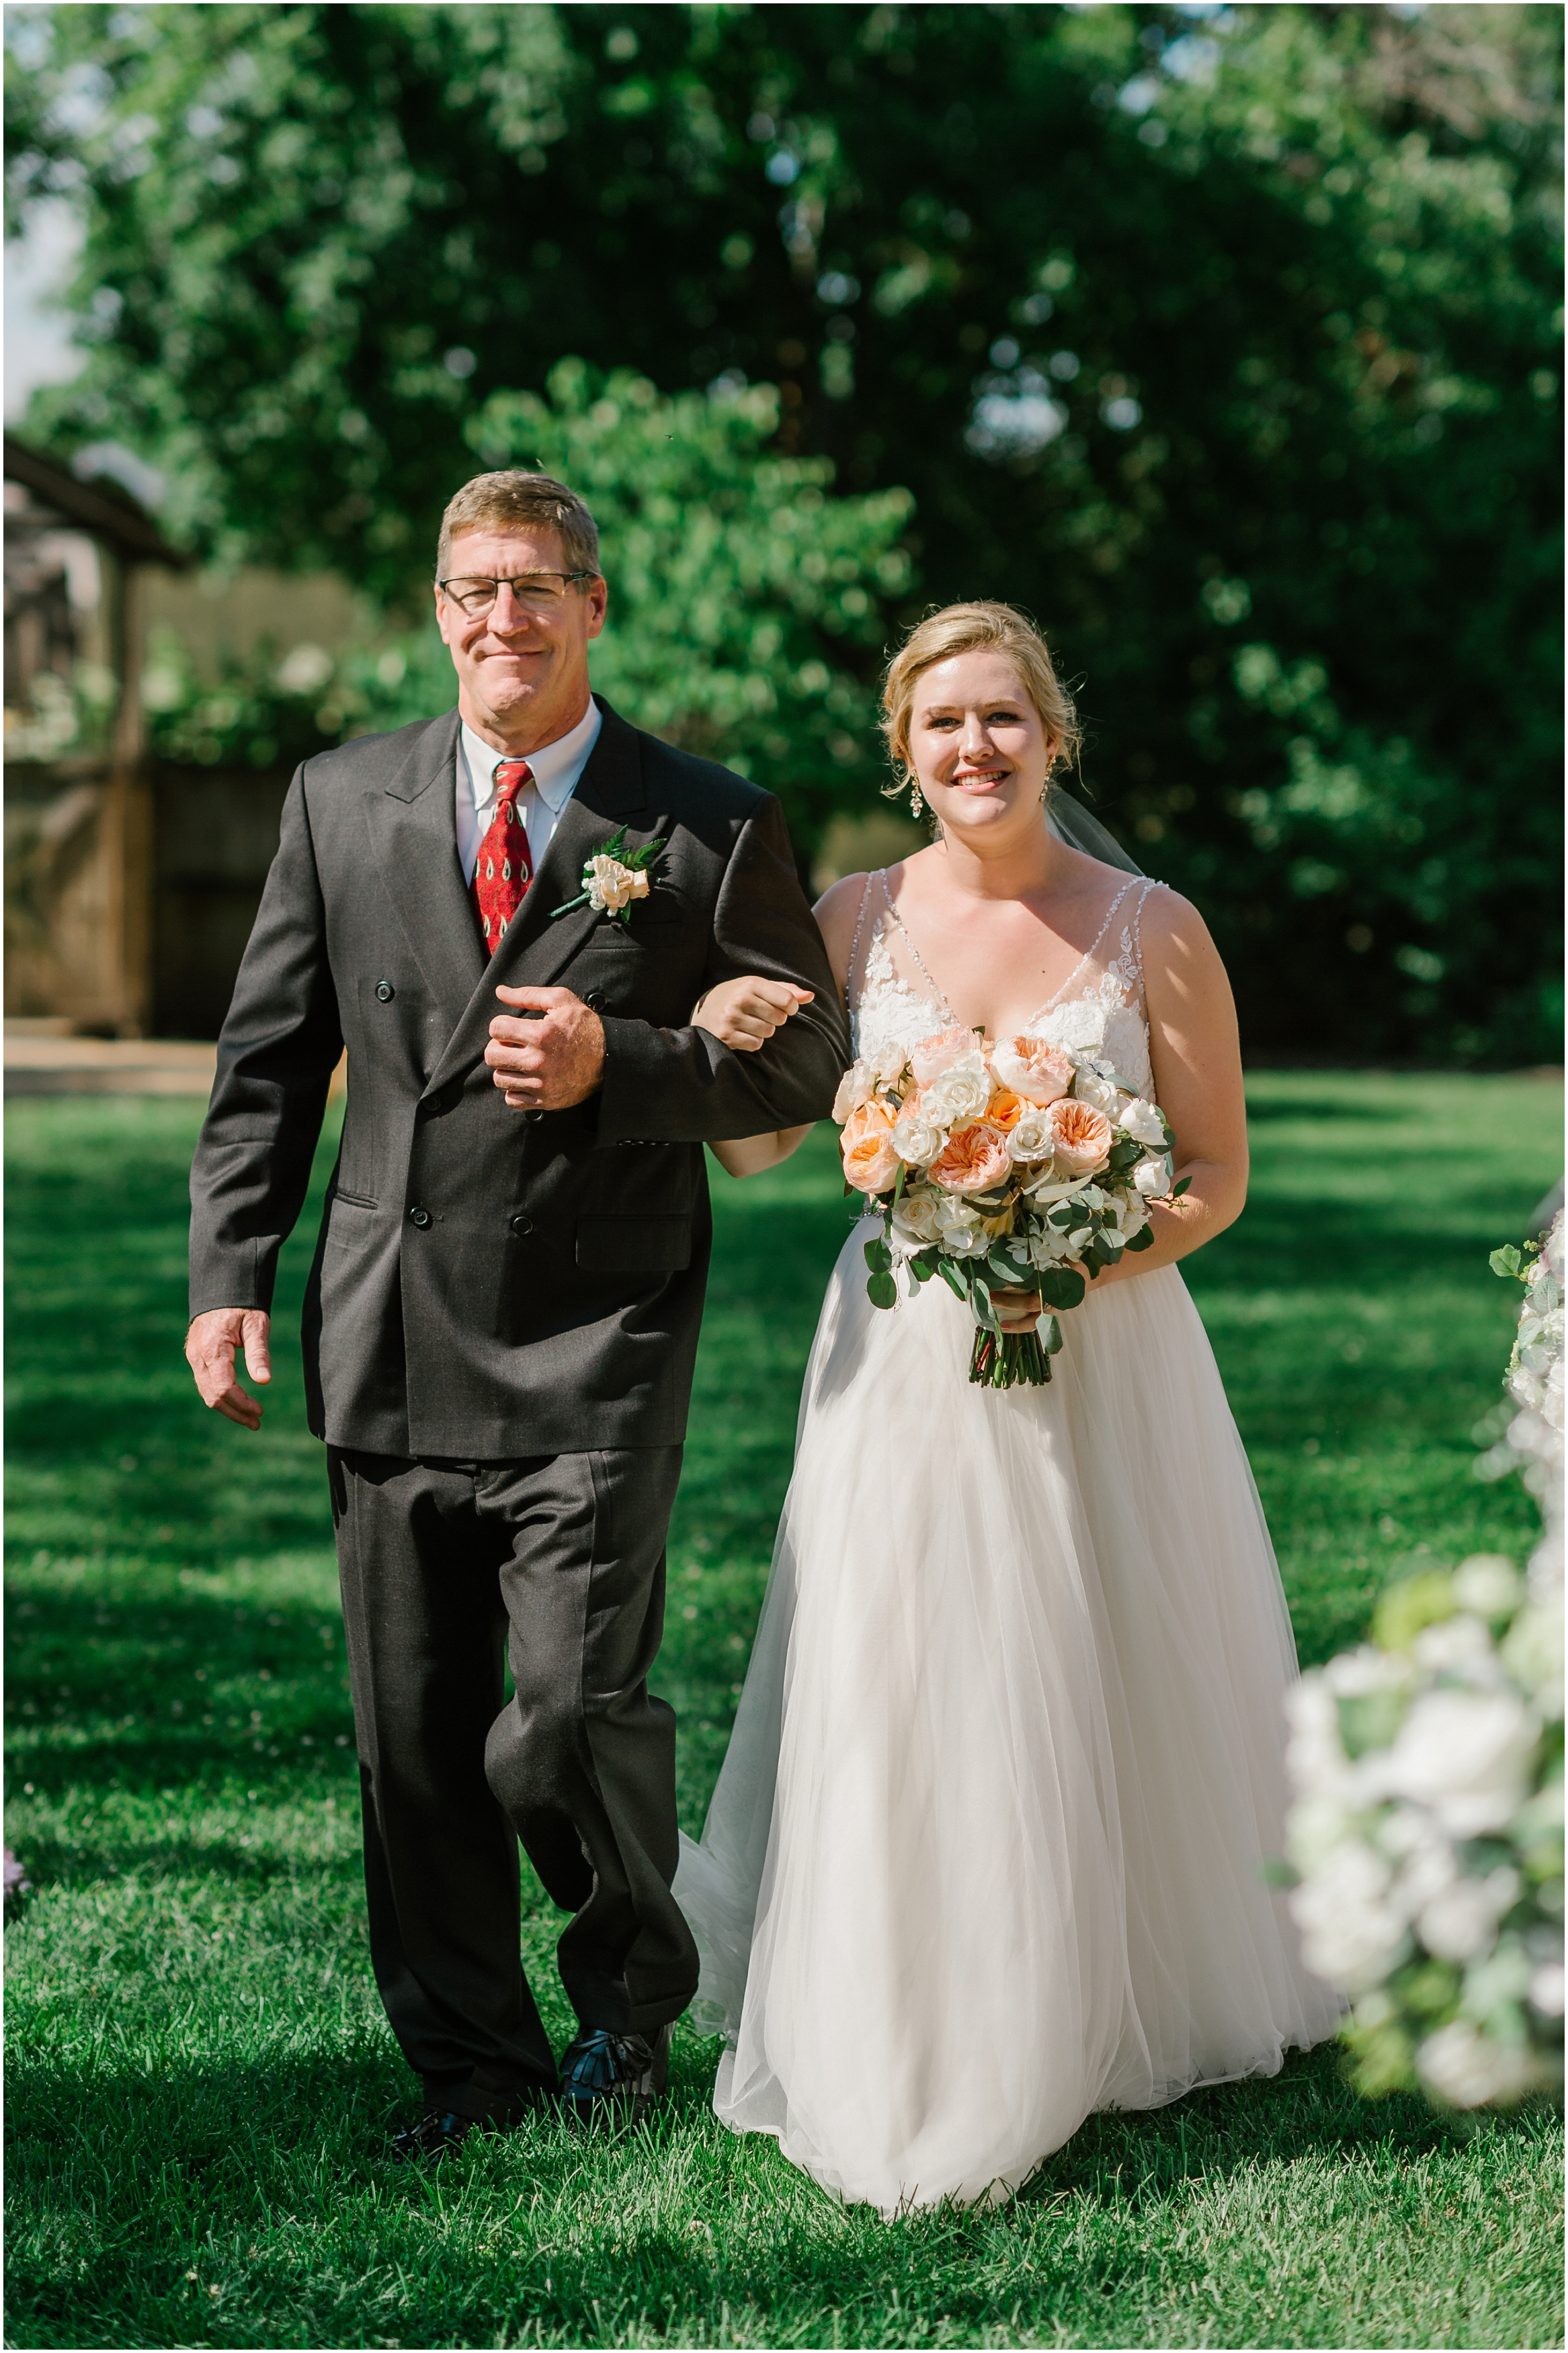 Rebecca_Shehorn_Photography_Indianapolis_Wedding_Photographer_8504.jpg